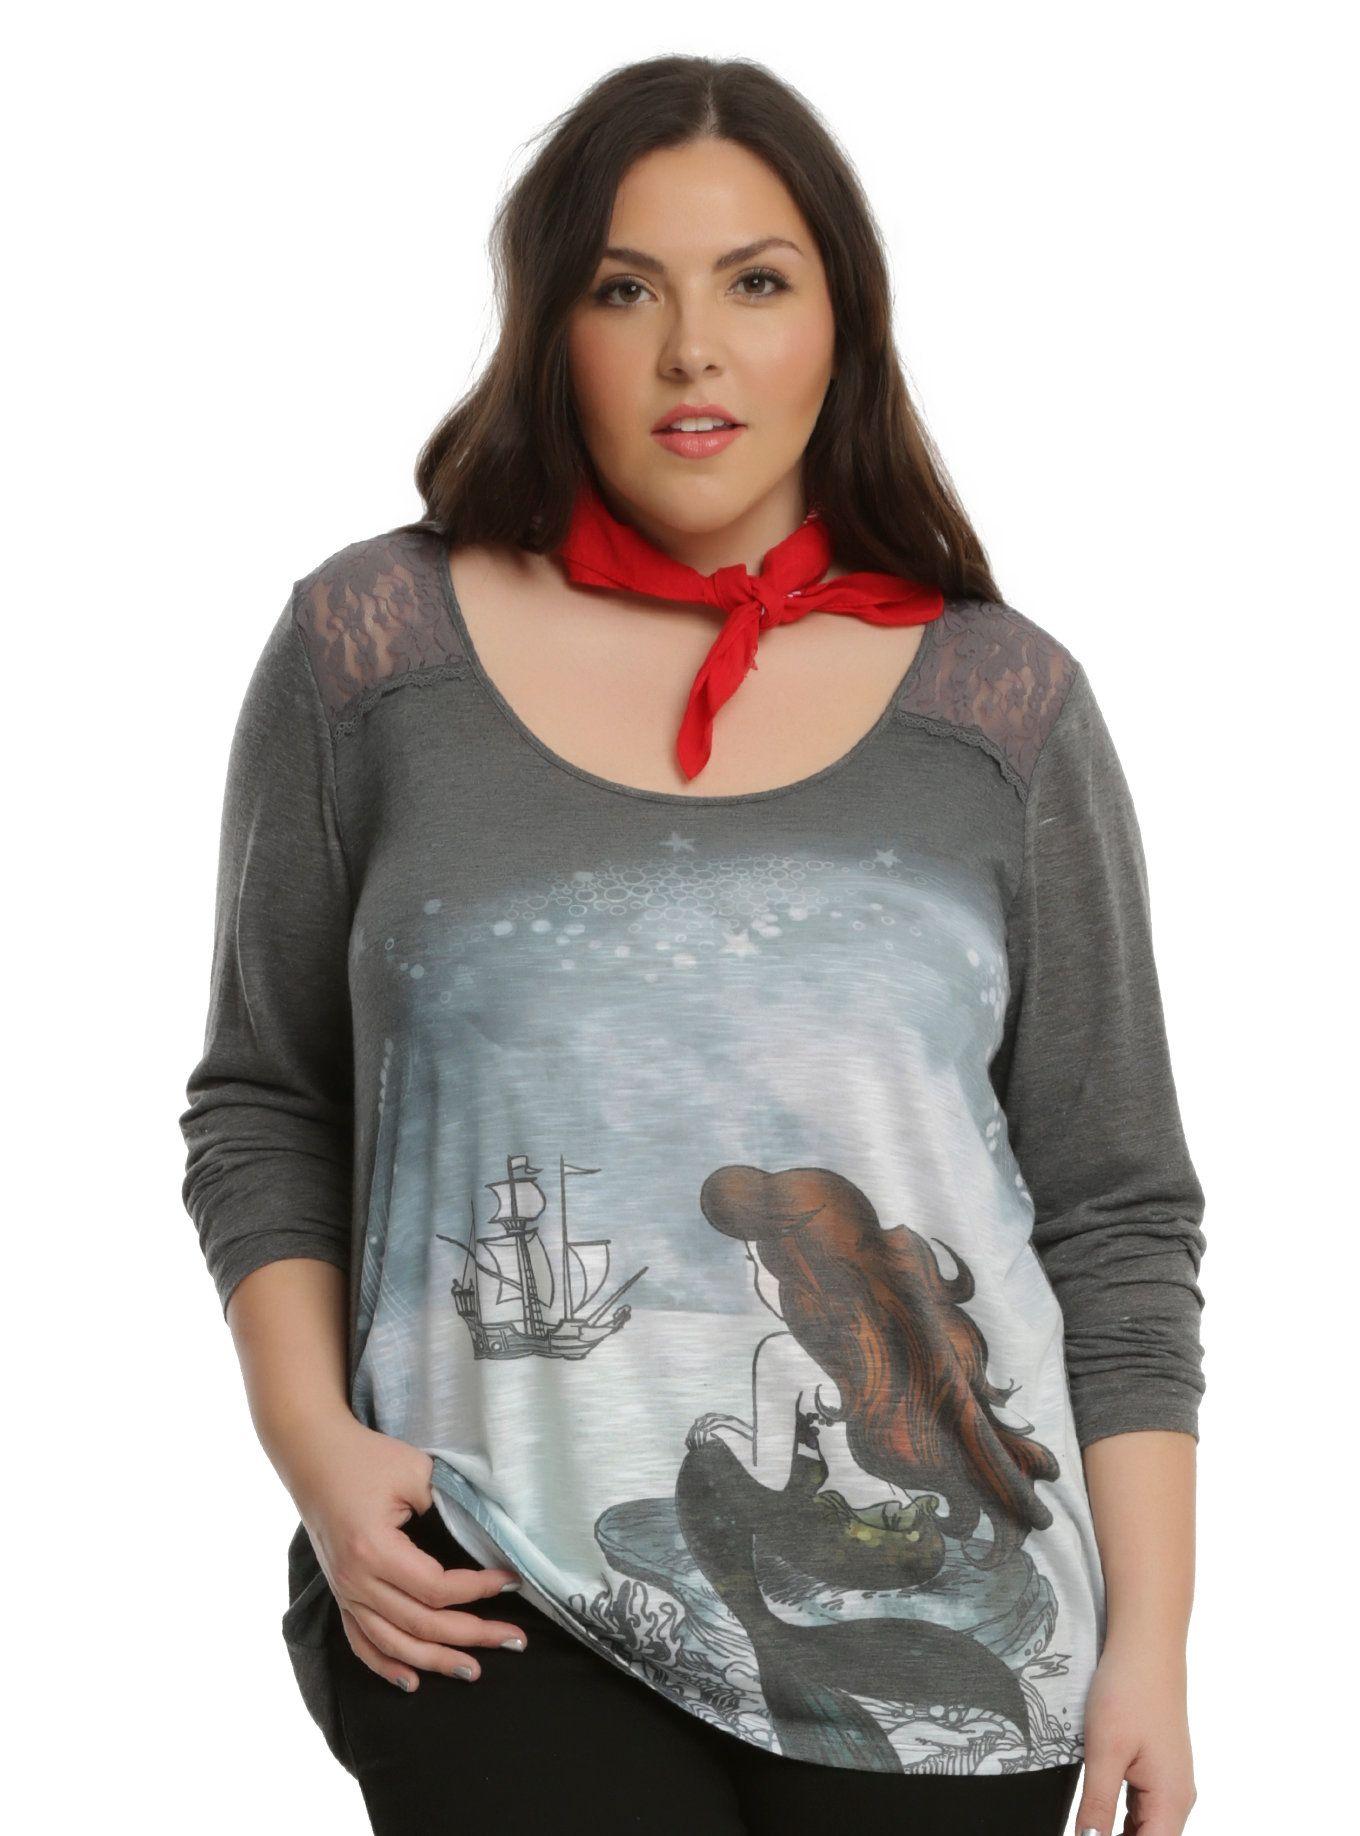 fb33f3df71c3c Disney The Little Mermaid Ariel Long-Sleeve Girls Top Plus Size ...